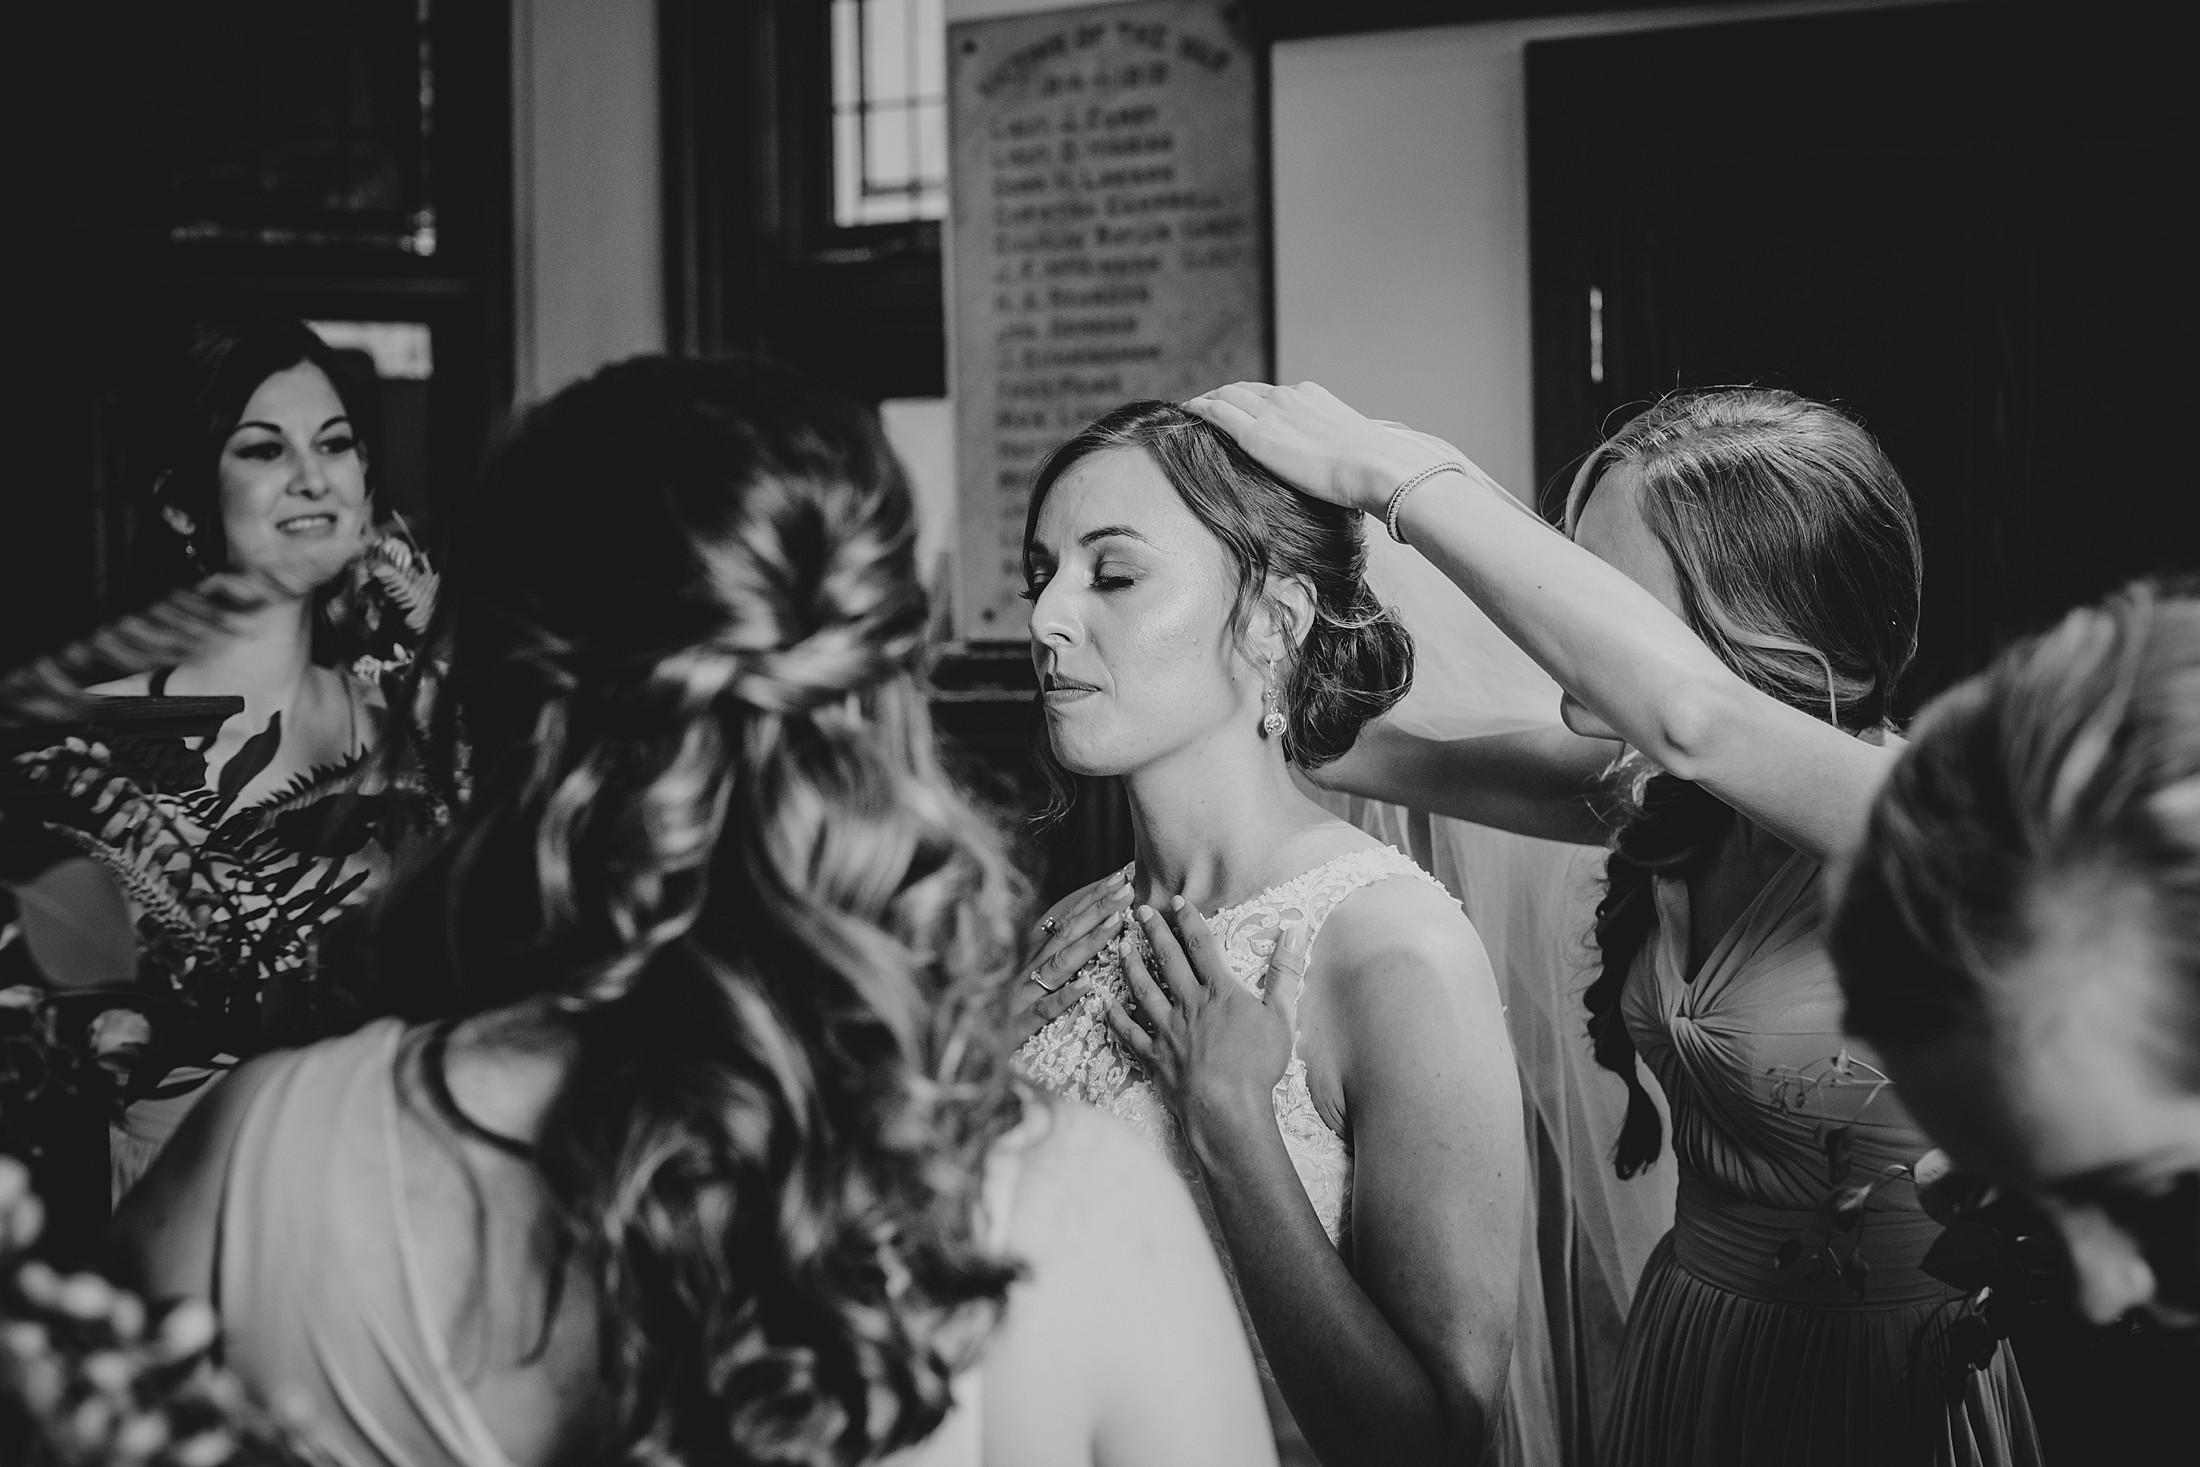 June9.LiamDanika148-2_Note Photography Documentary Photographer Wedding Photos Vancouver B.C. Best of 2018 2019 2020 Vancouver Island Okanagan Banff Edmonton Victoria.jpg